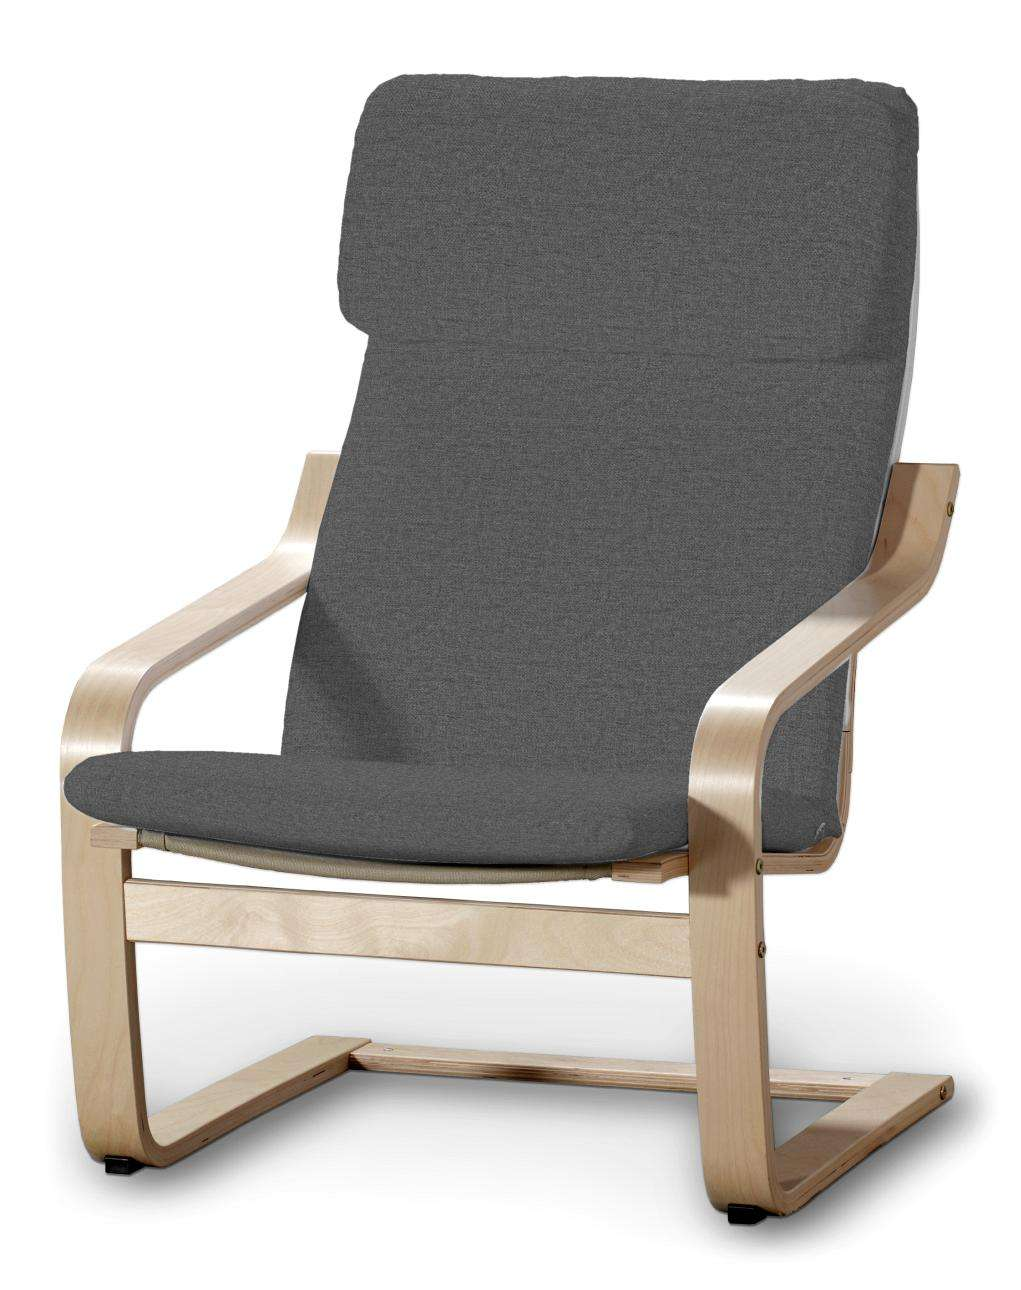 Poduszka na fotel Poäng Fotel Poäng w kolekcji Edinburgh, tkanina: 115-77